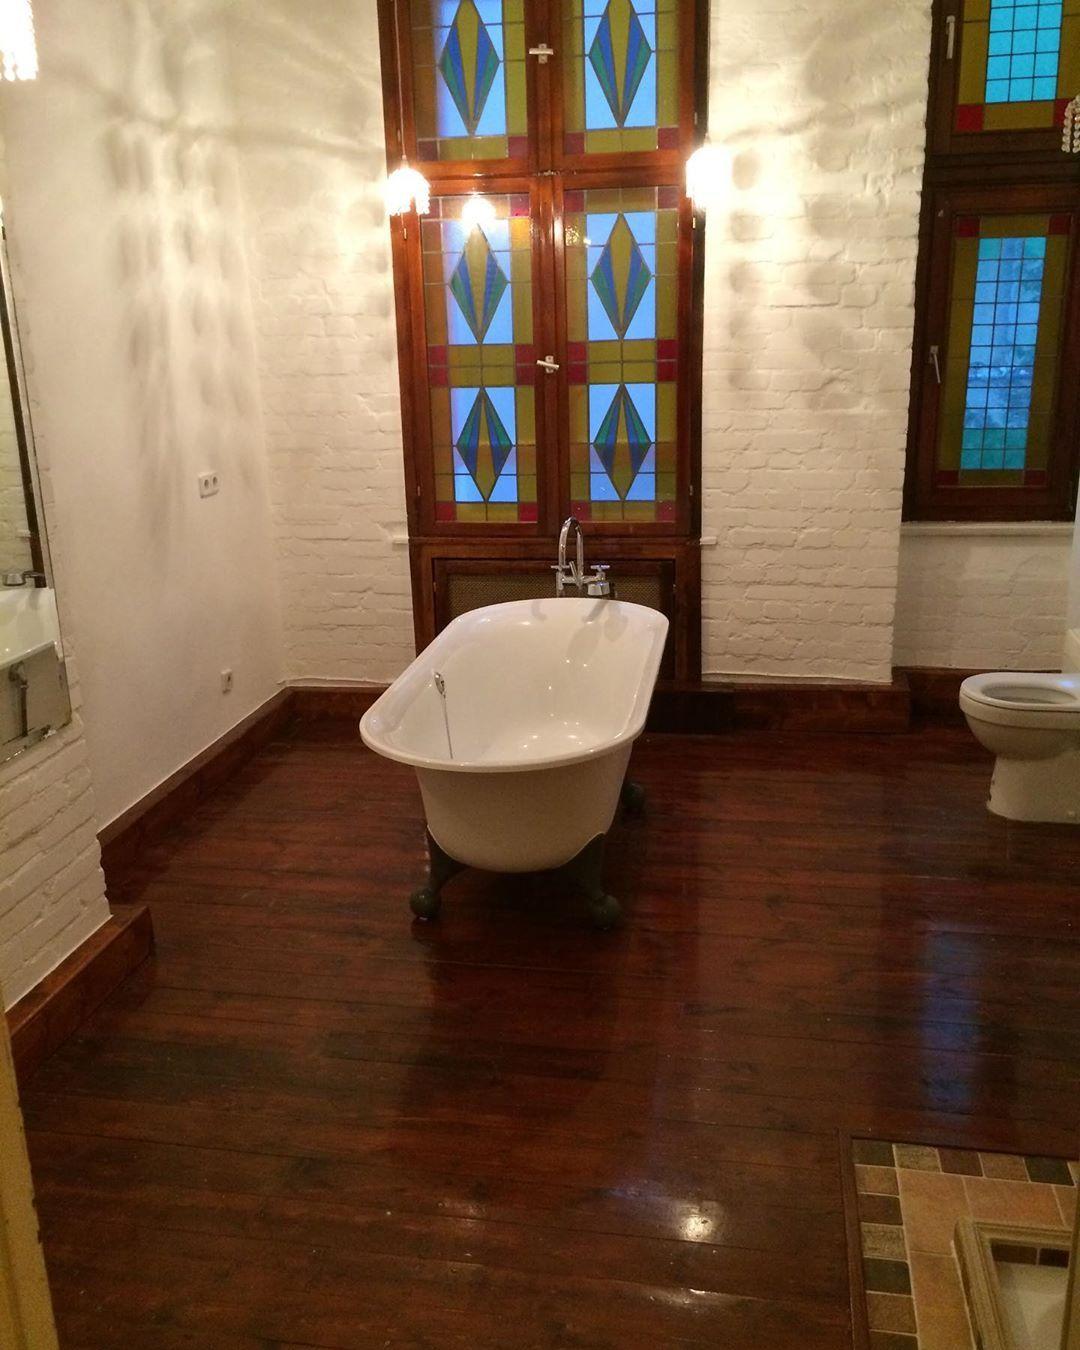 Alletjut On Instagram Berliner Altbau Badezimmer Mal Anders Bathroomdesign Home Altbau Woodworking Woodworker Spandau Berli Altbau Badezimmer Und Renovierung